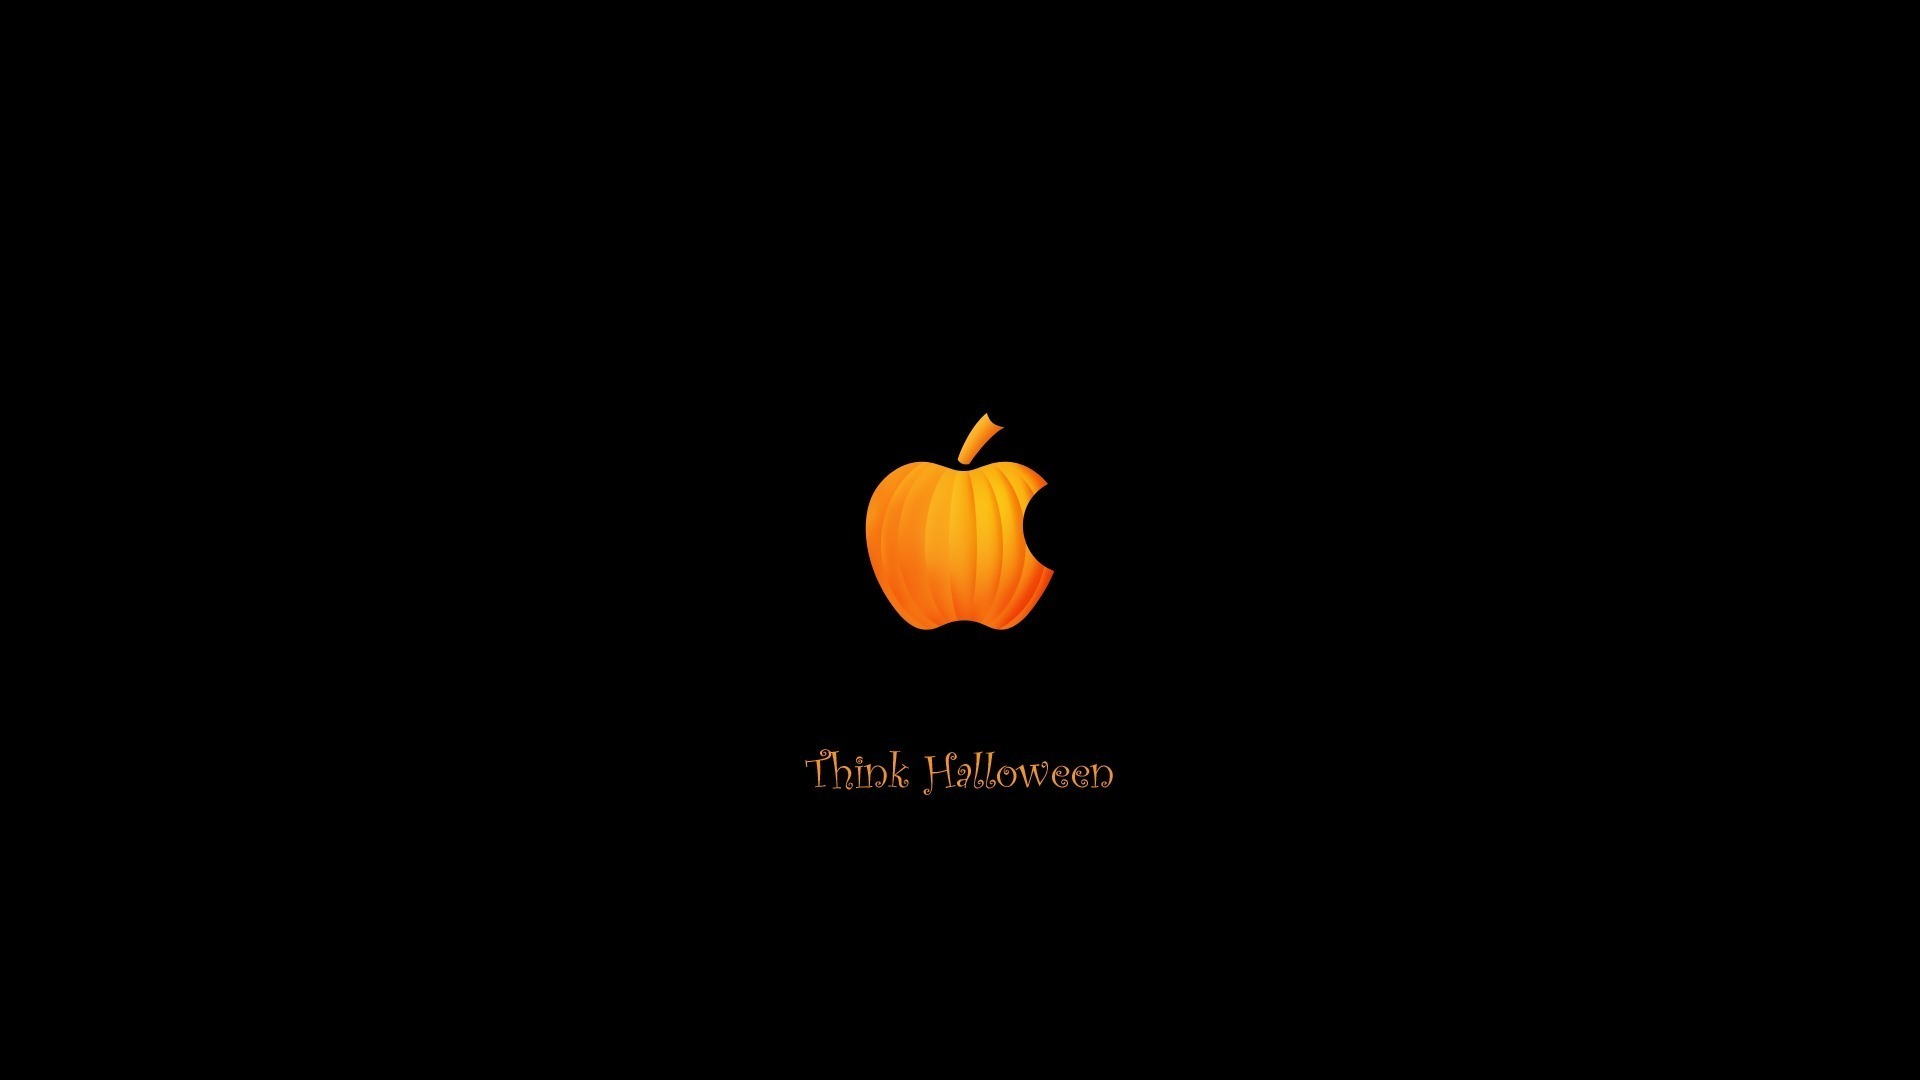 download wallpaper: Think Halloween wallpaper